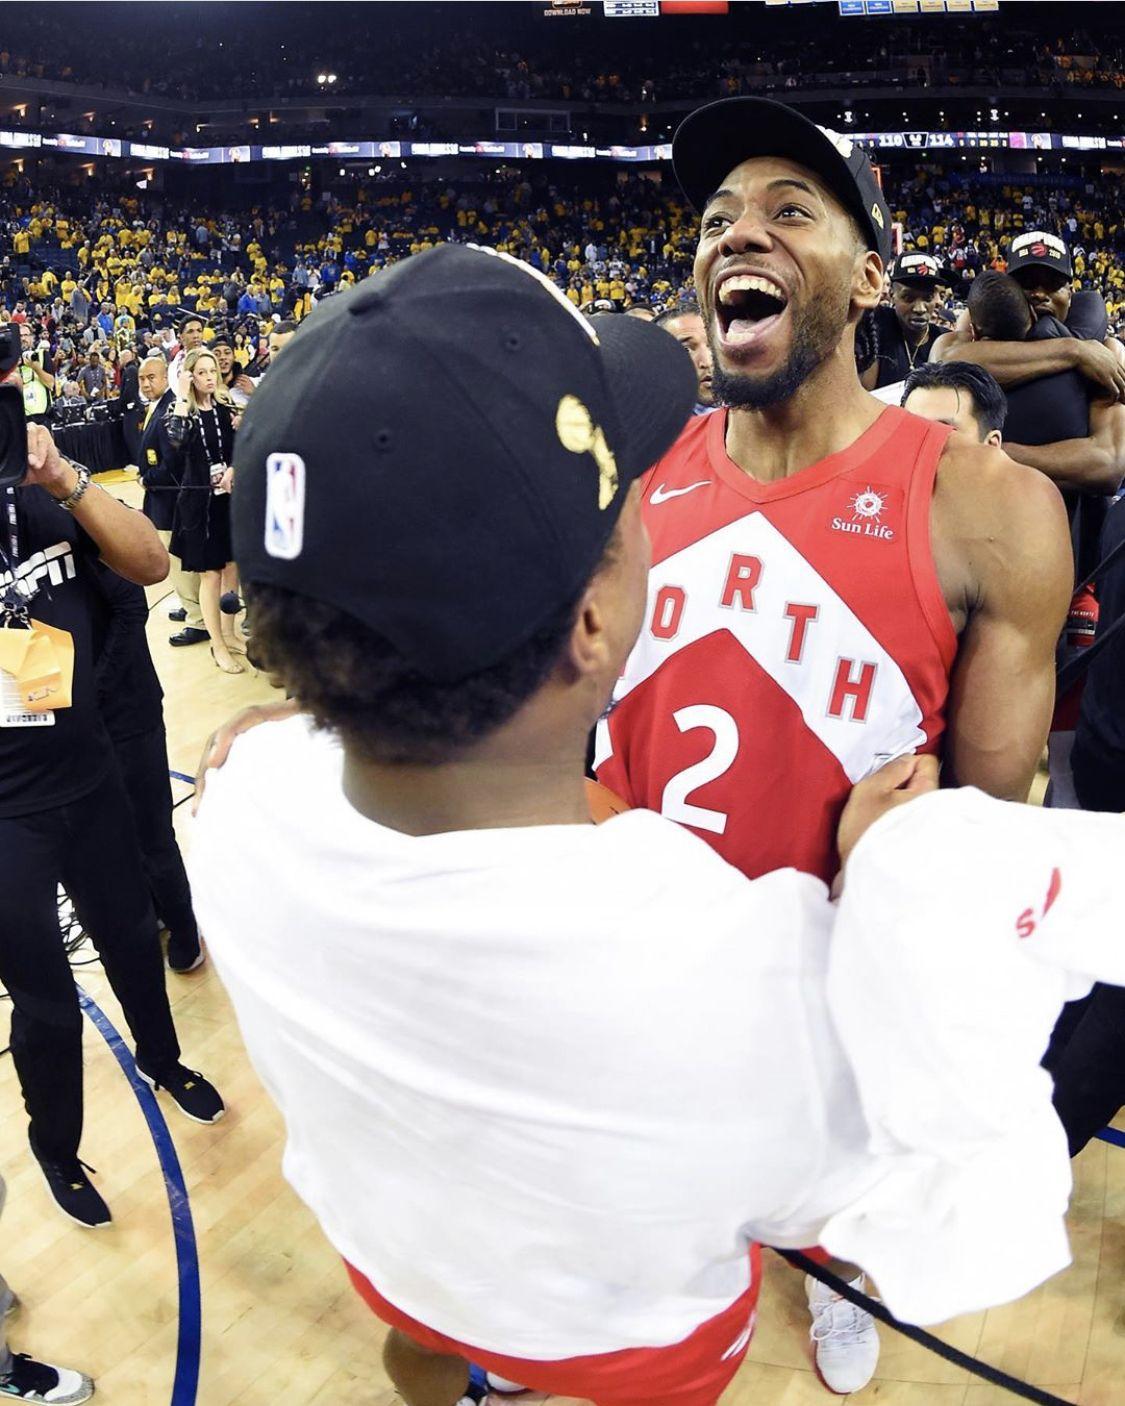 All smiles 🏆 Nba players, Toronto raptors, Maple leafs